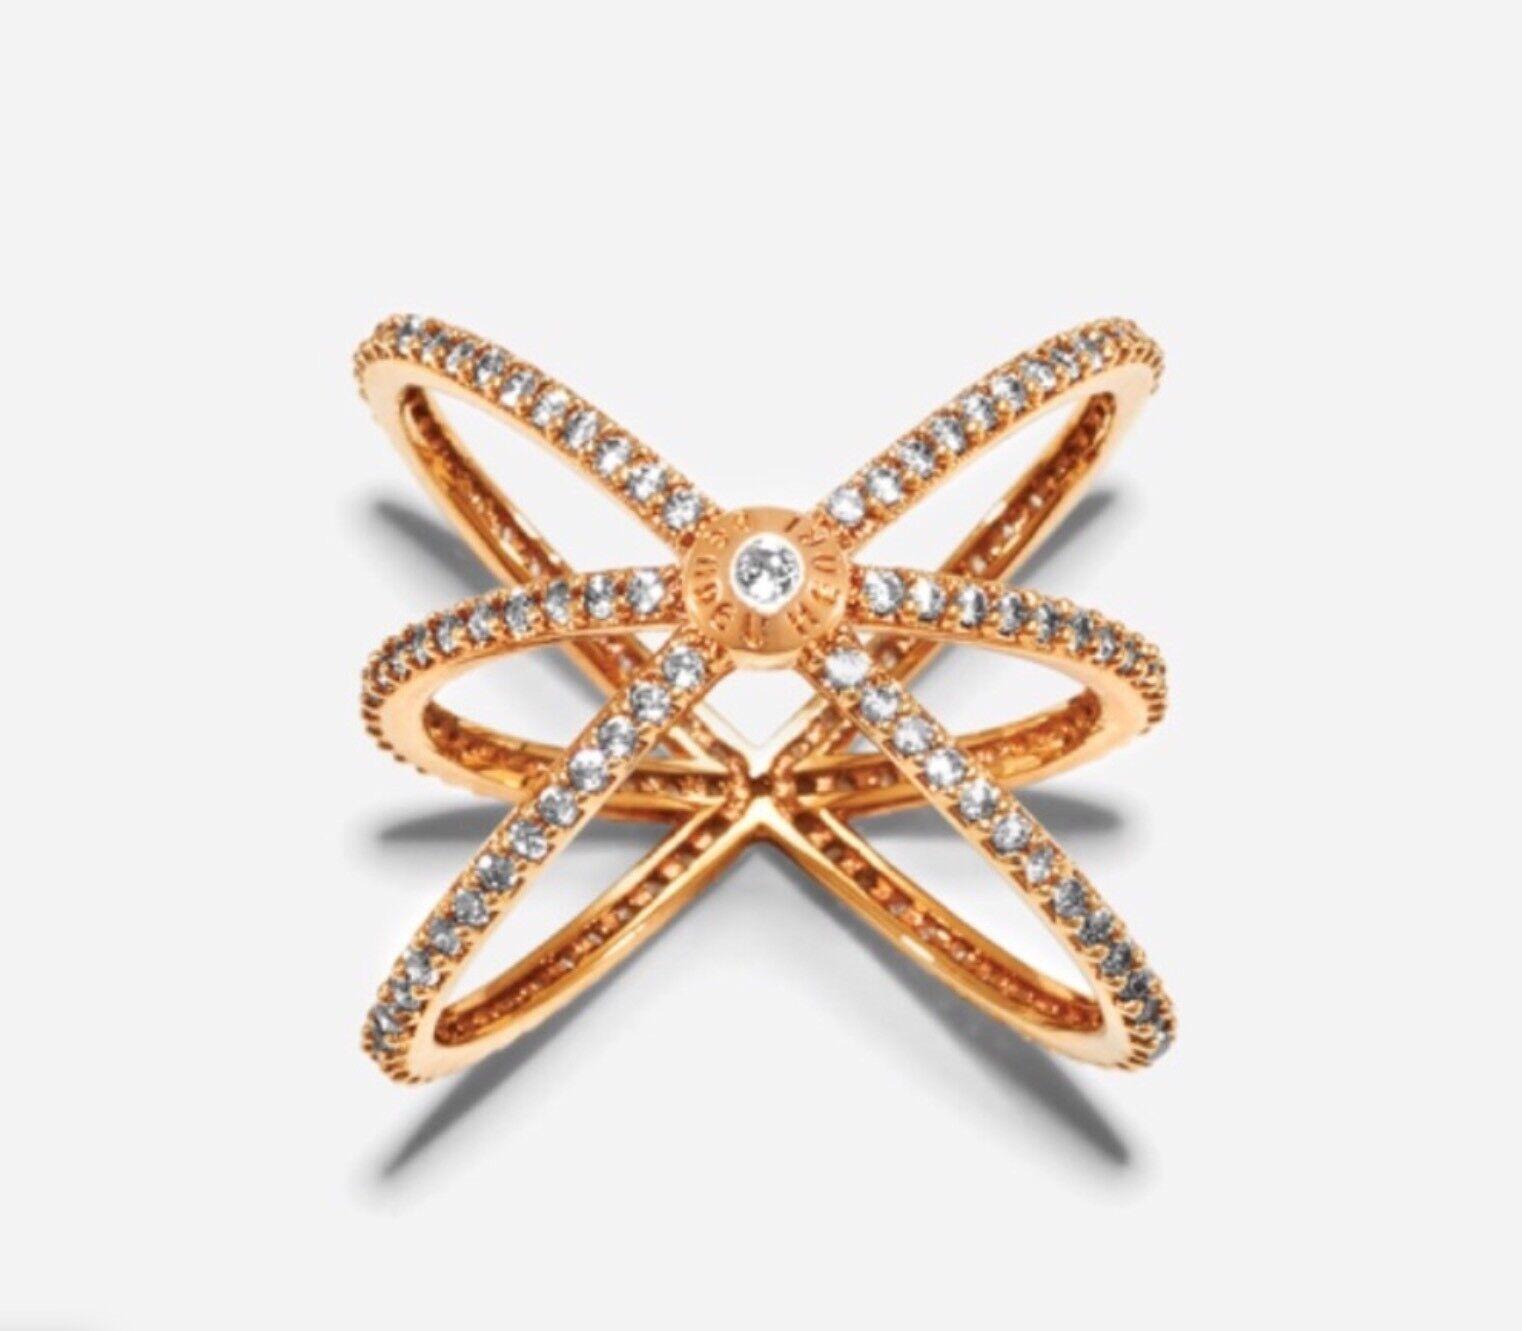 Women's Luxe Pave Orbital Cuff Ring